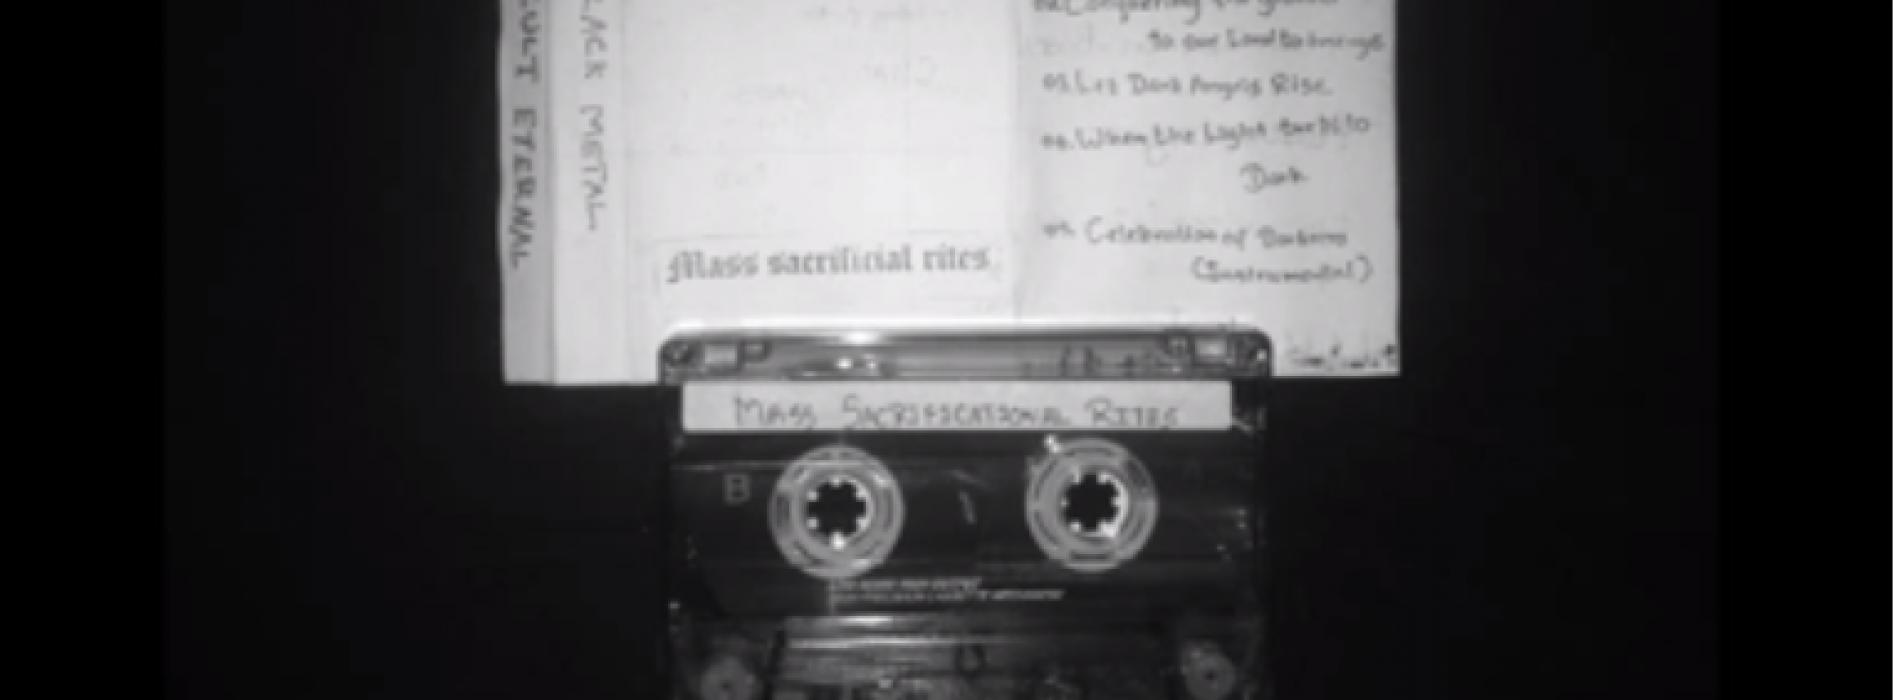 ArrA – Celebration of Darkness (Mass Sacrificial Rites Demo 2012)